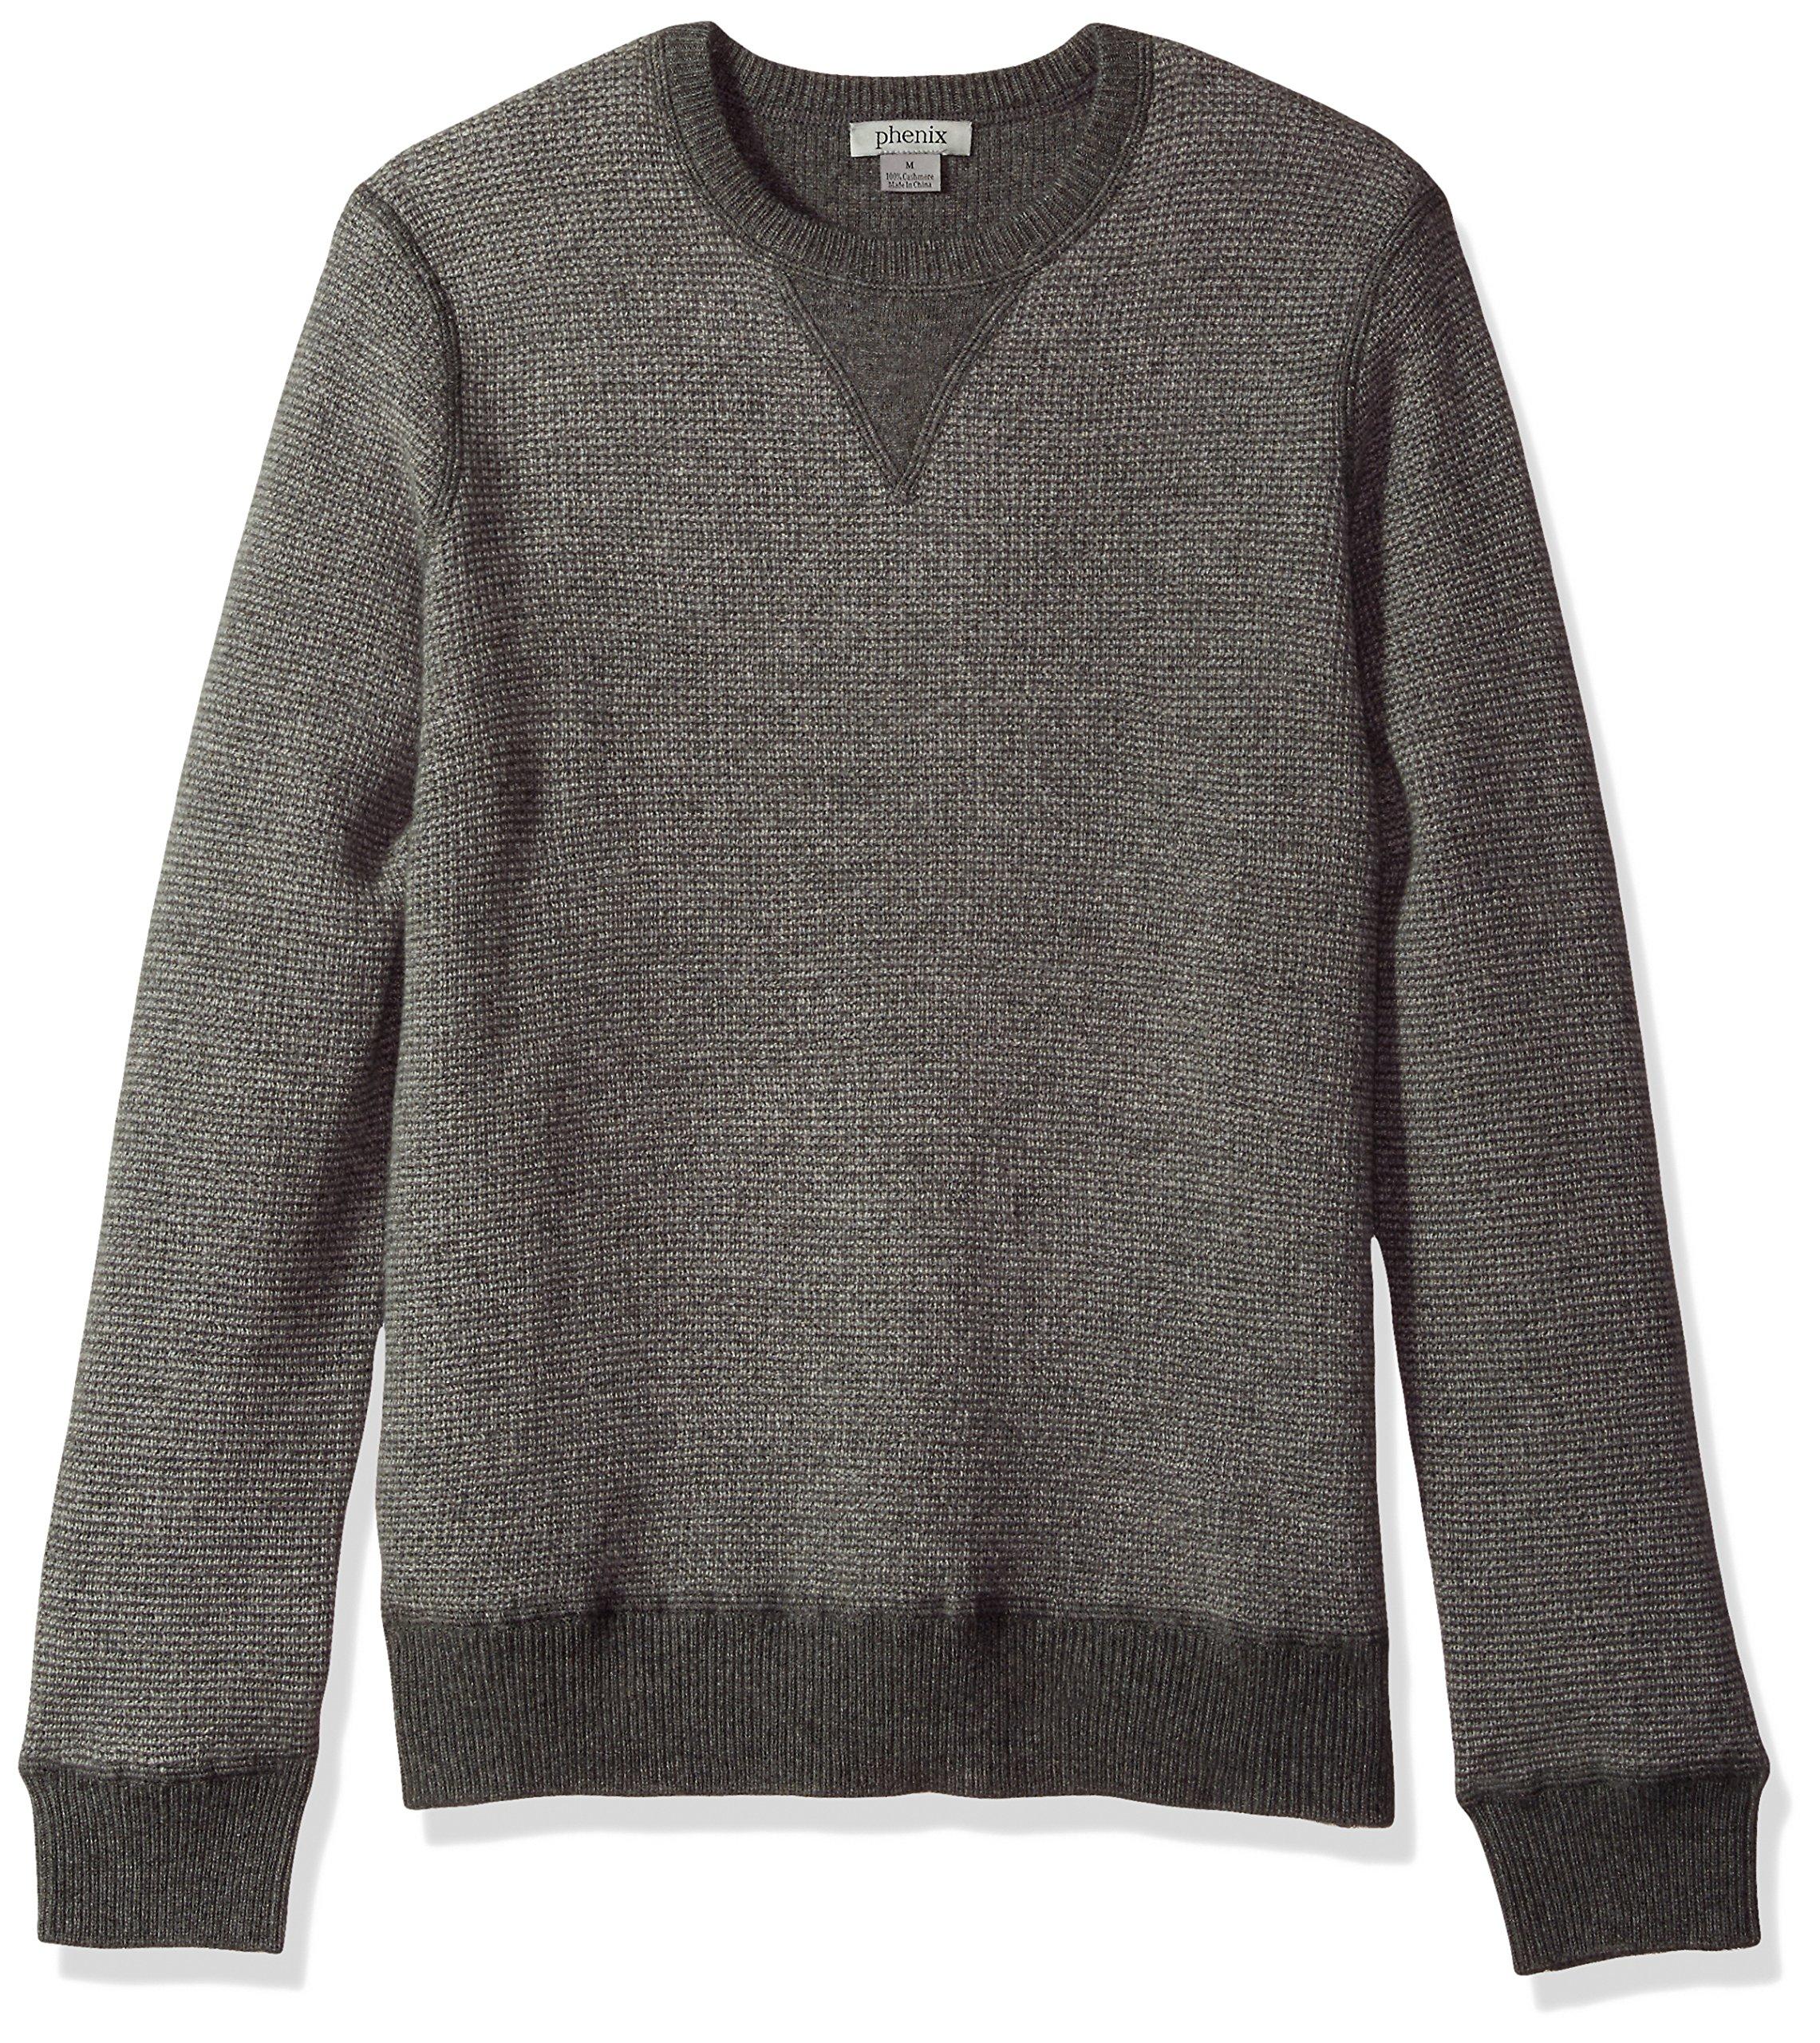 Phenix Cashmere Men's 100% Cashmere 2 Tone Waffle Crew Neck Sweater, Dark Grey/Light Grey, Medium